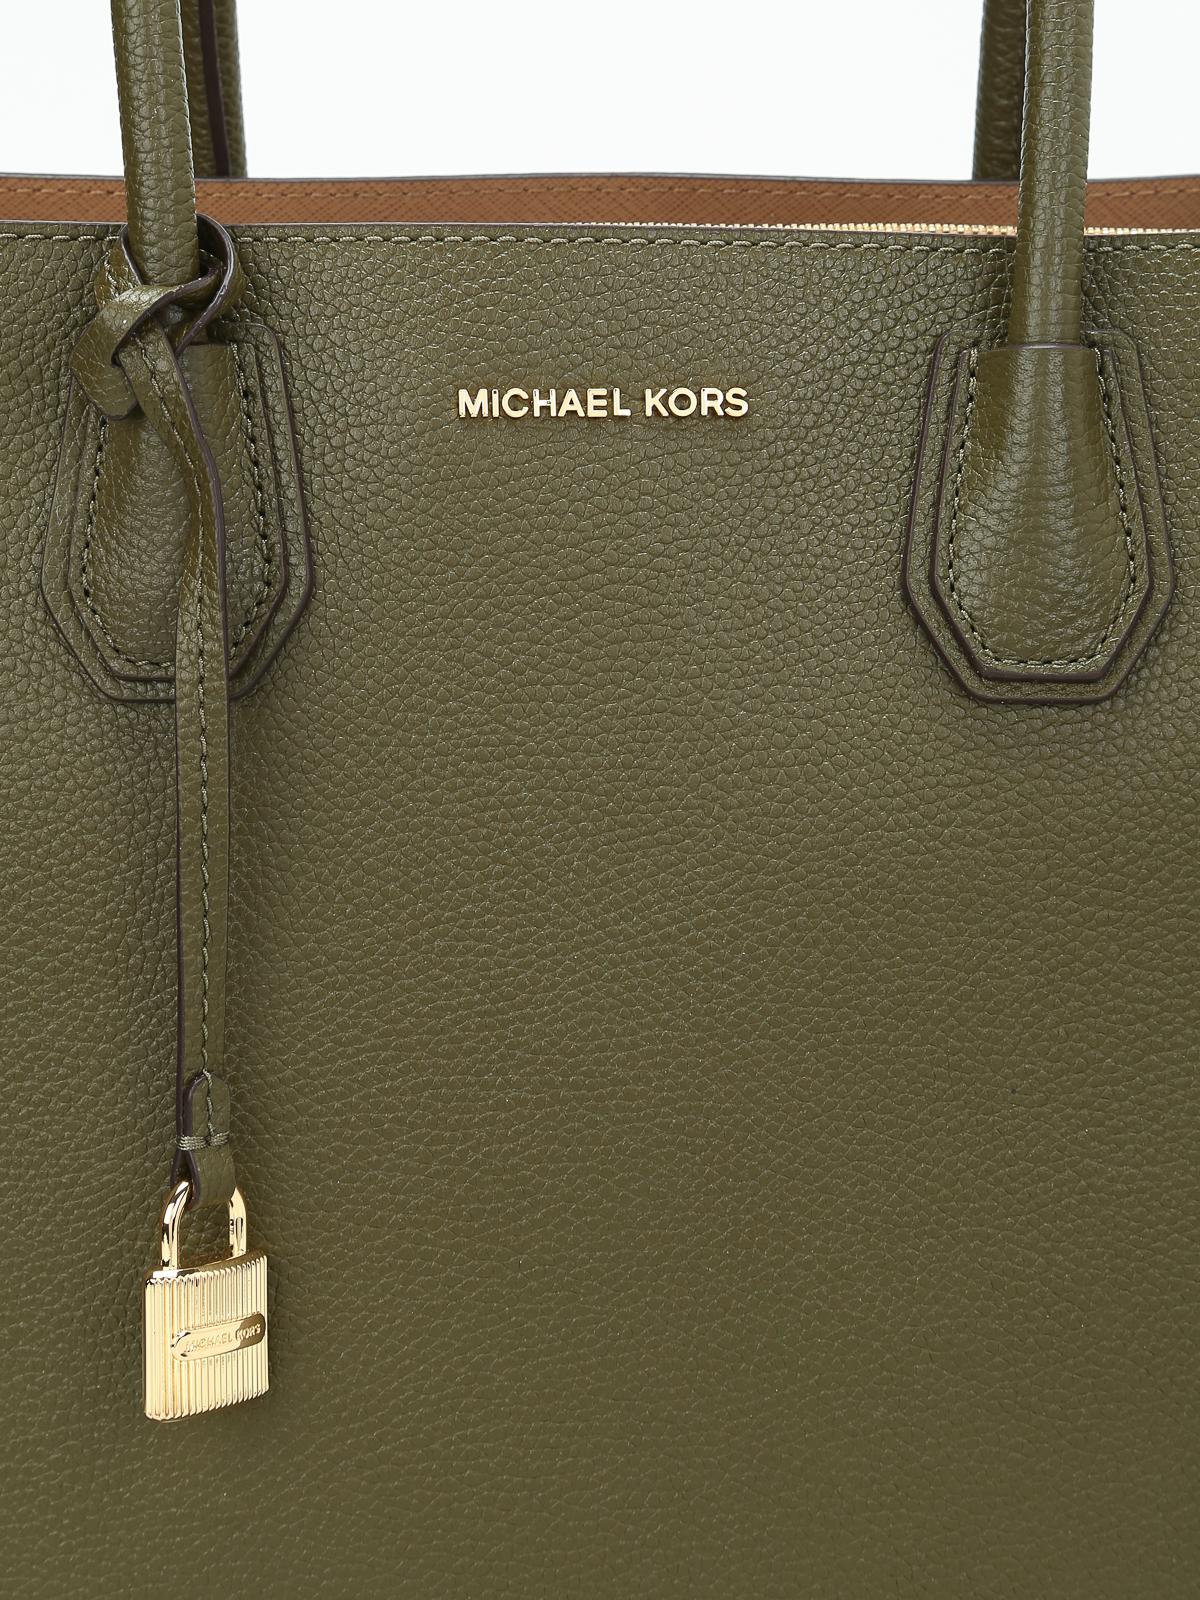 Michael Kors - Sac Cabas - Mercer - Sacs à main - 30F6GM9T3L333